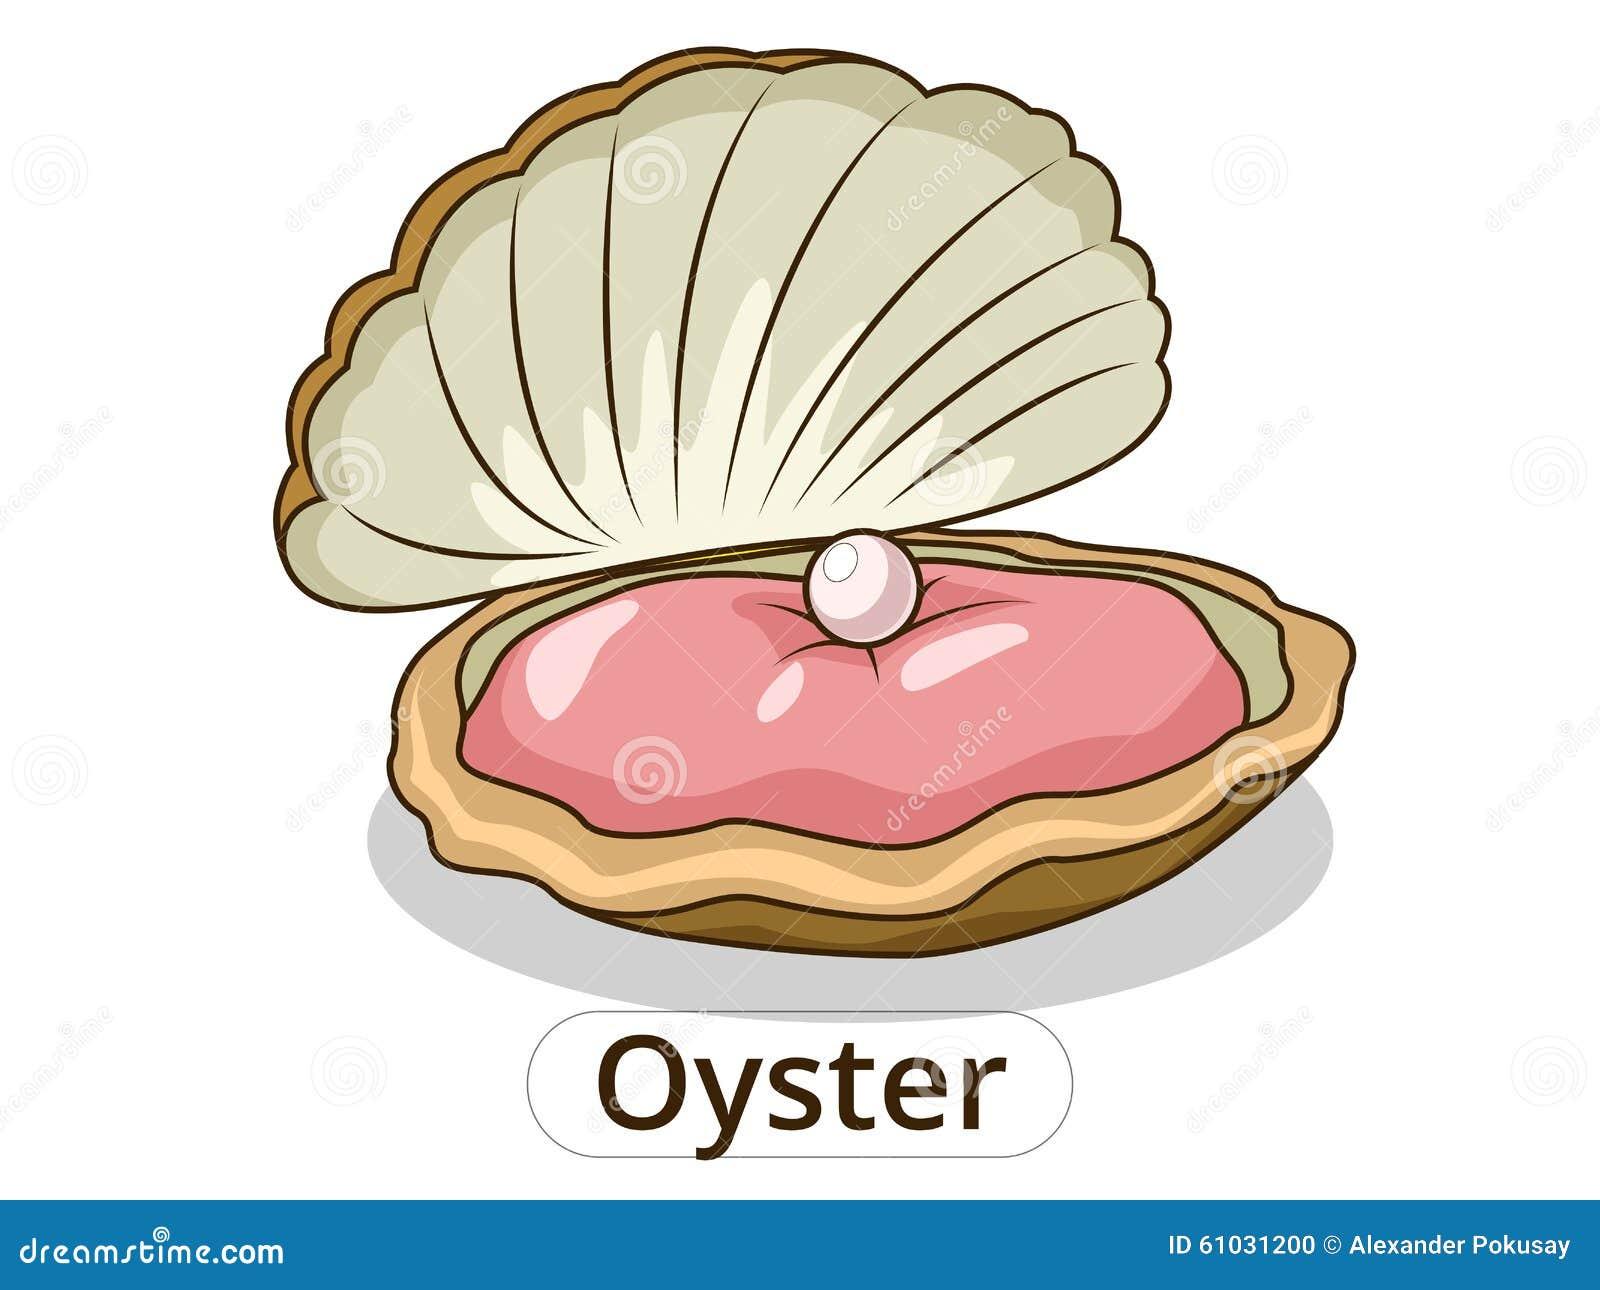 Oyster Underwater Animal Cartoon Illustration Stock Vector